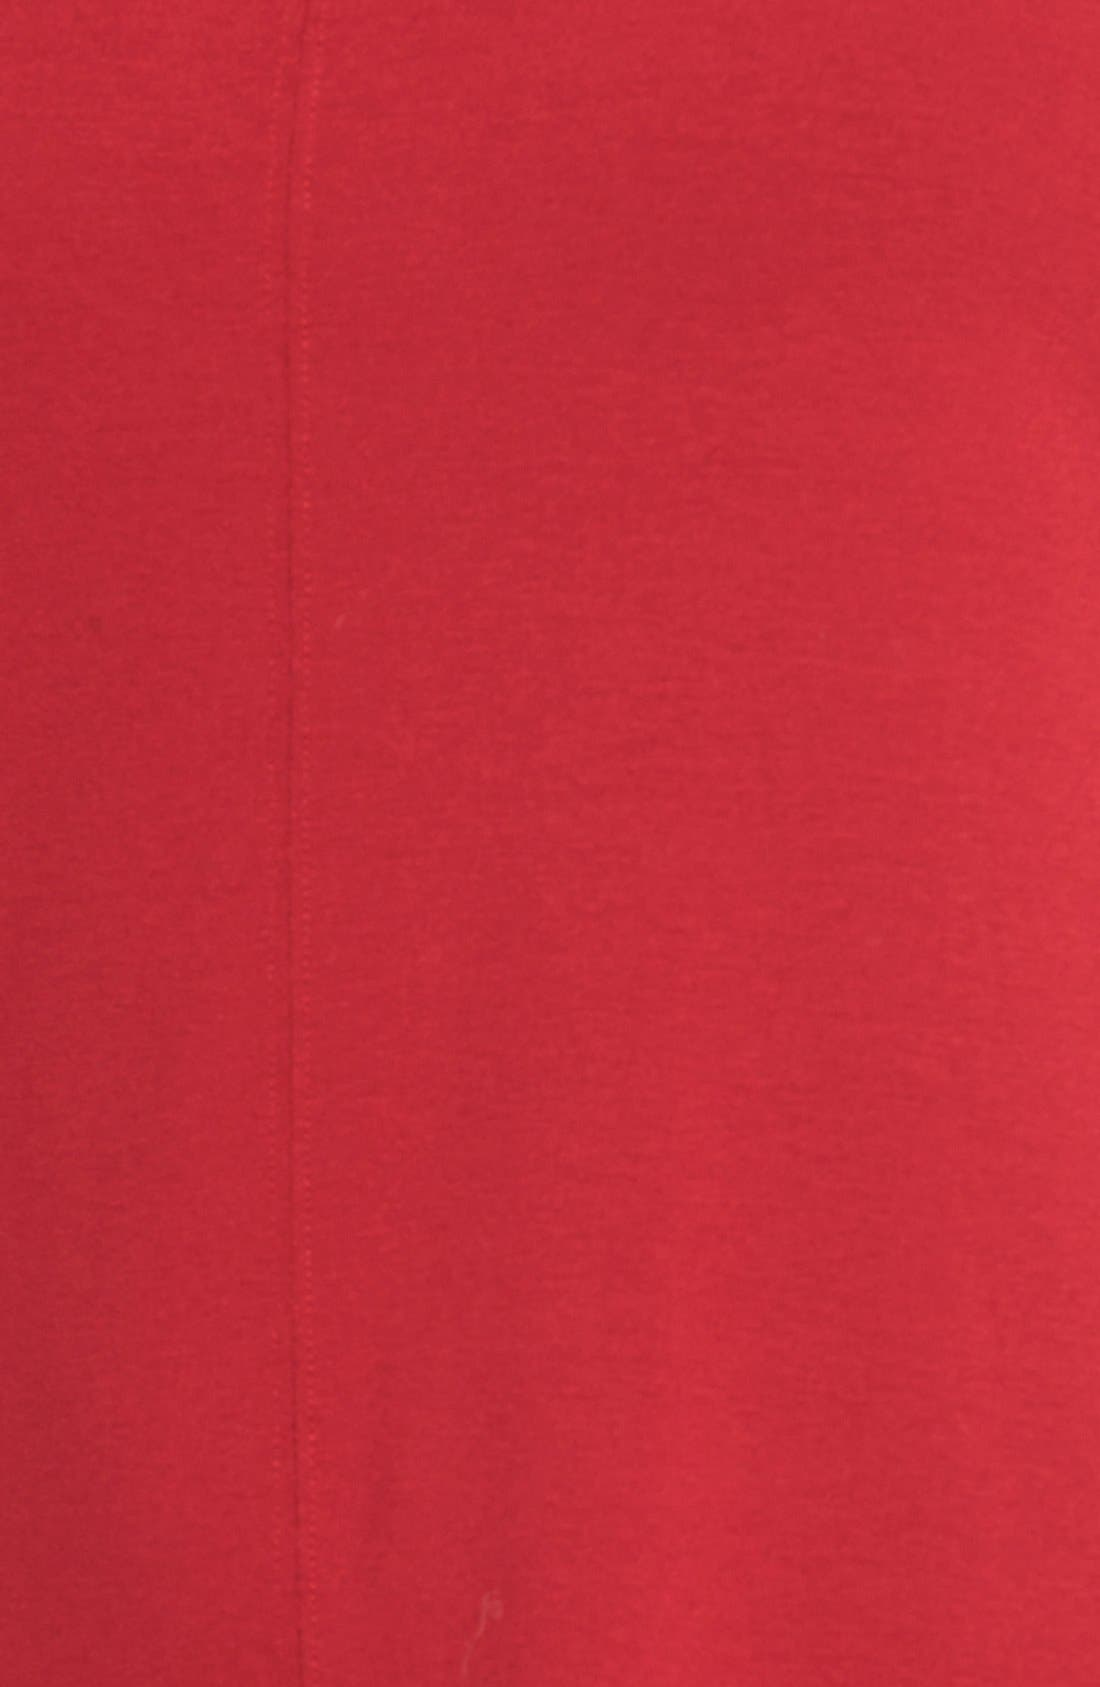 Jersey Bateau Neck Tunic,                             Alternate thumbnail 72, color,